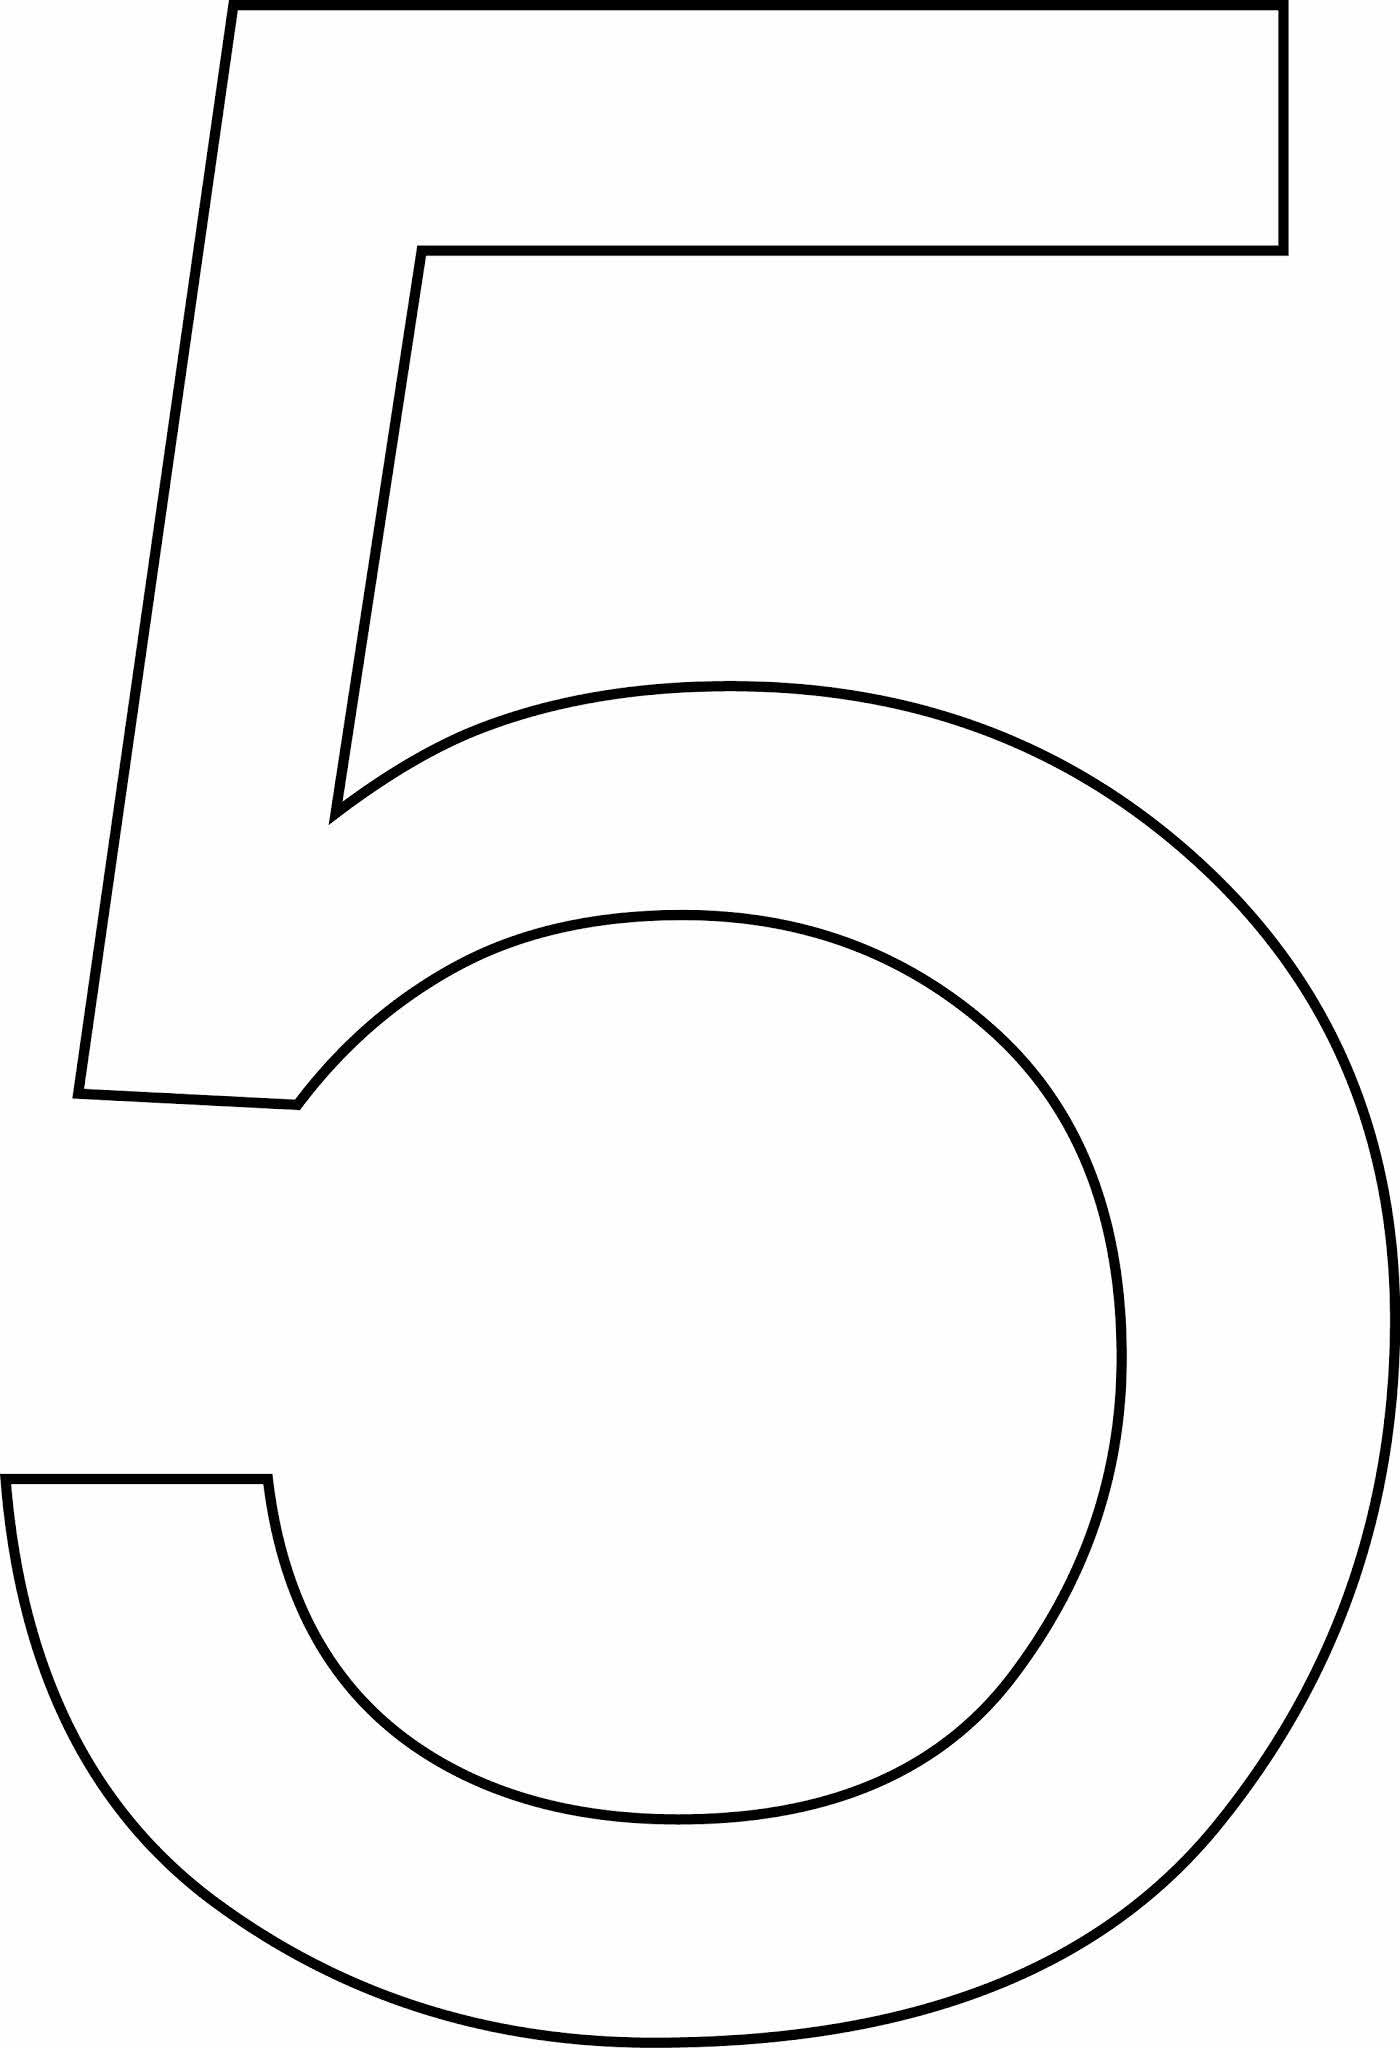 Número 5 (cinco) para imprimir